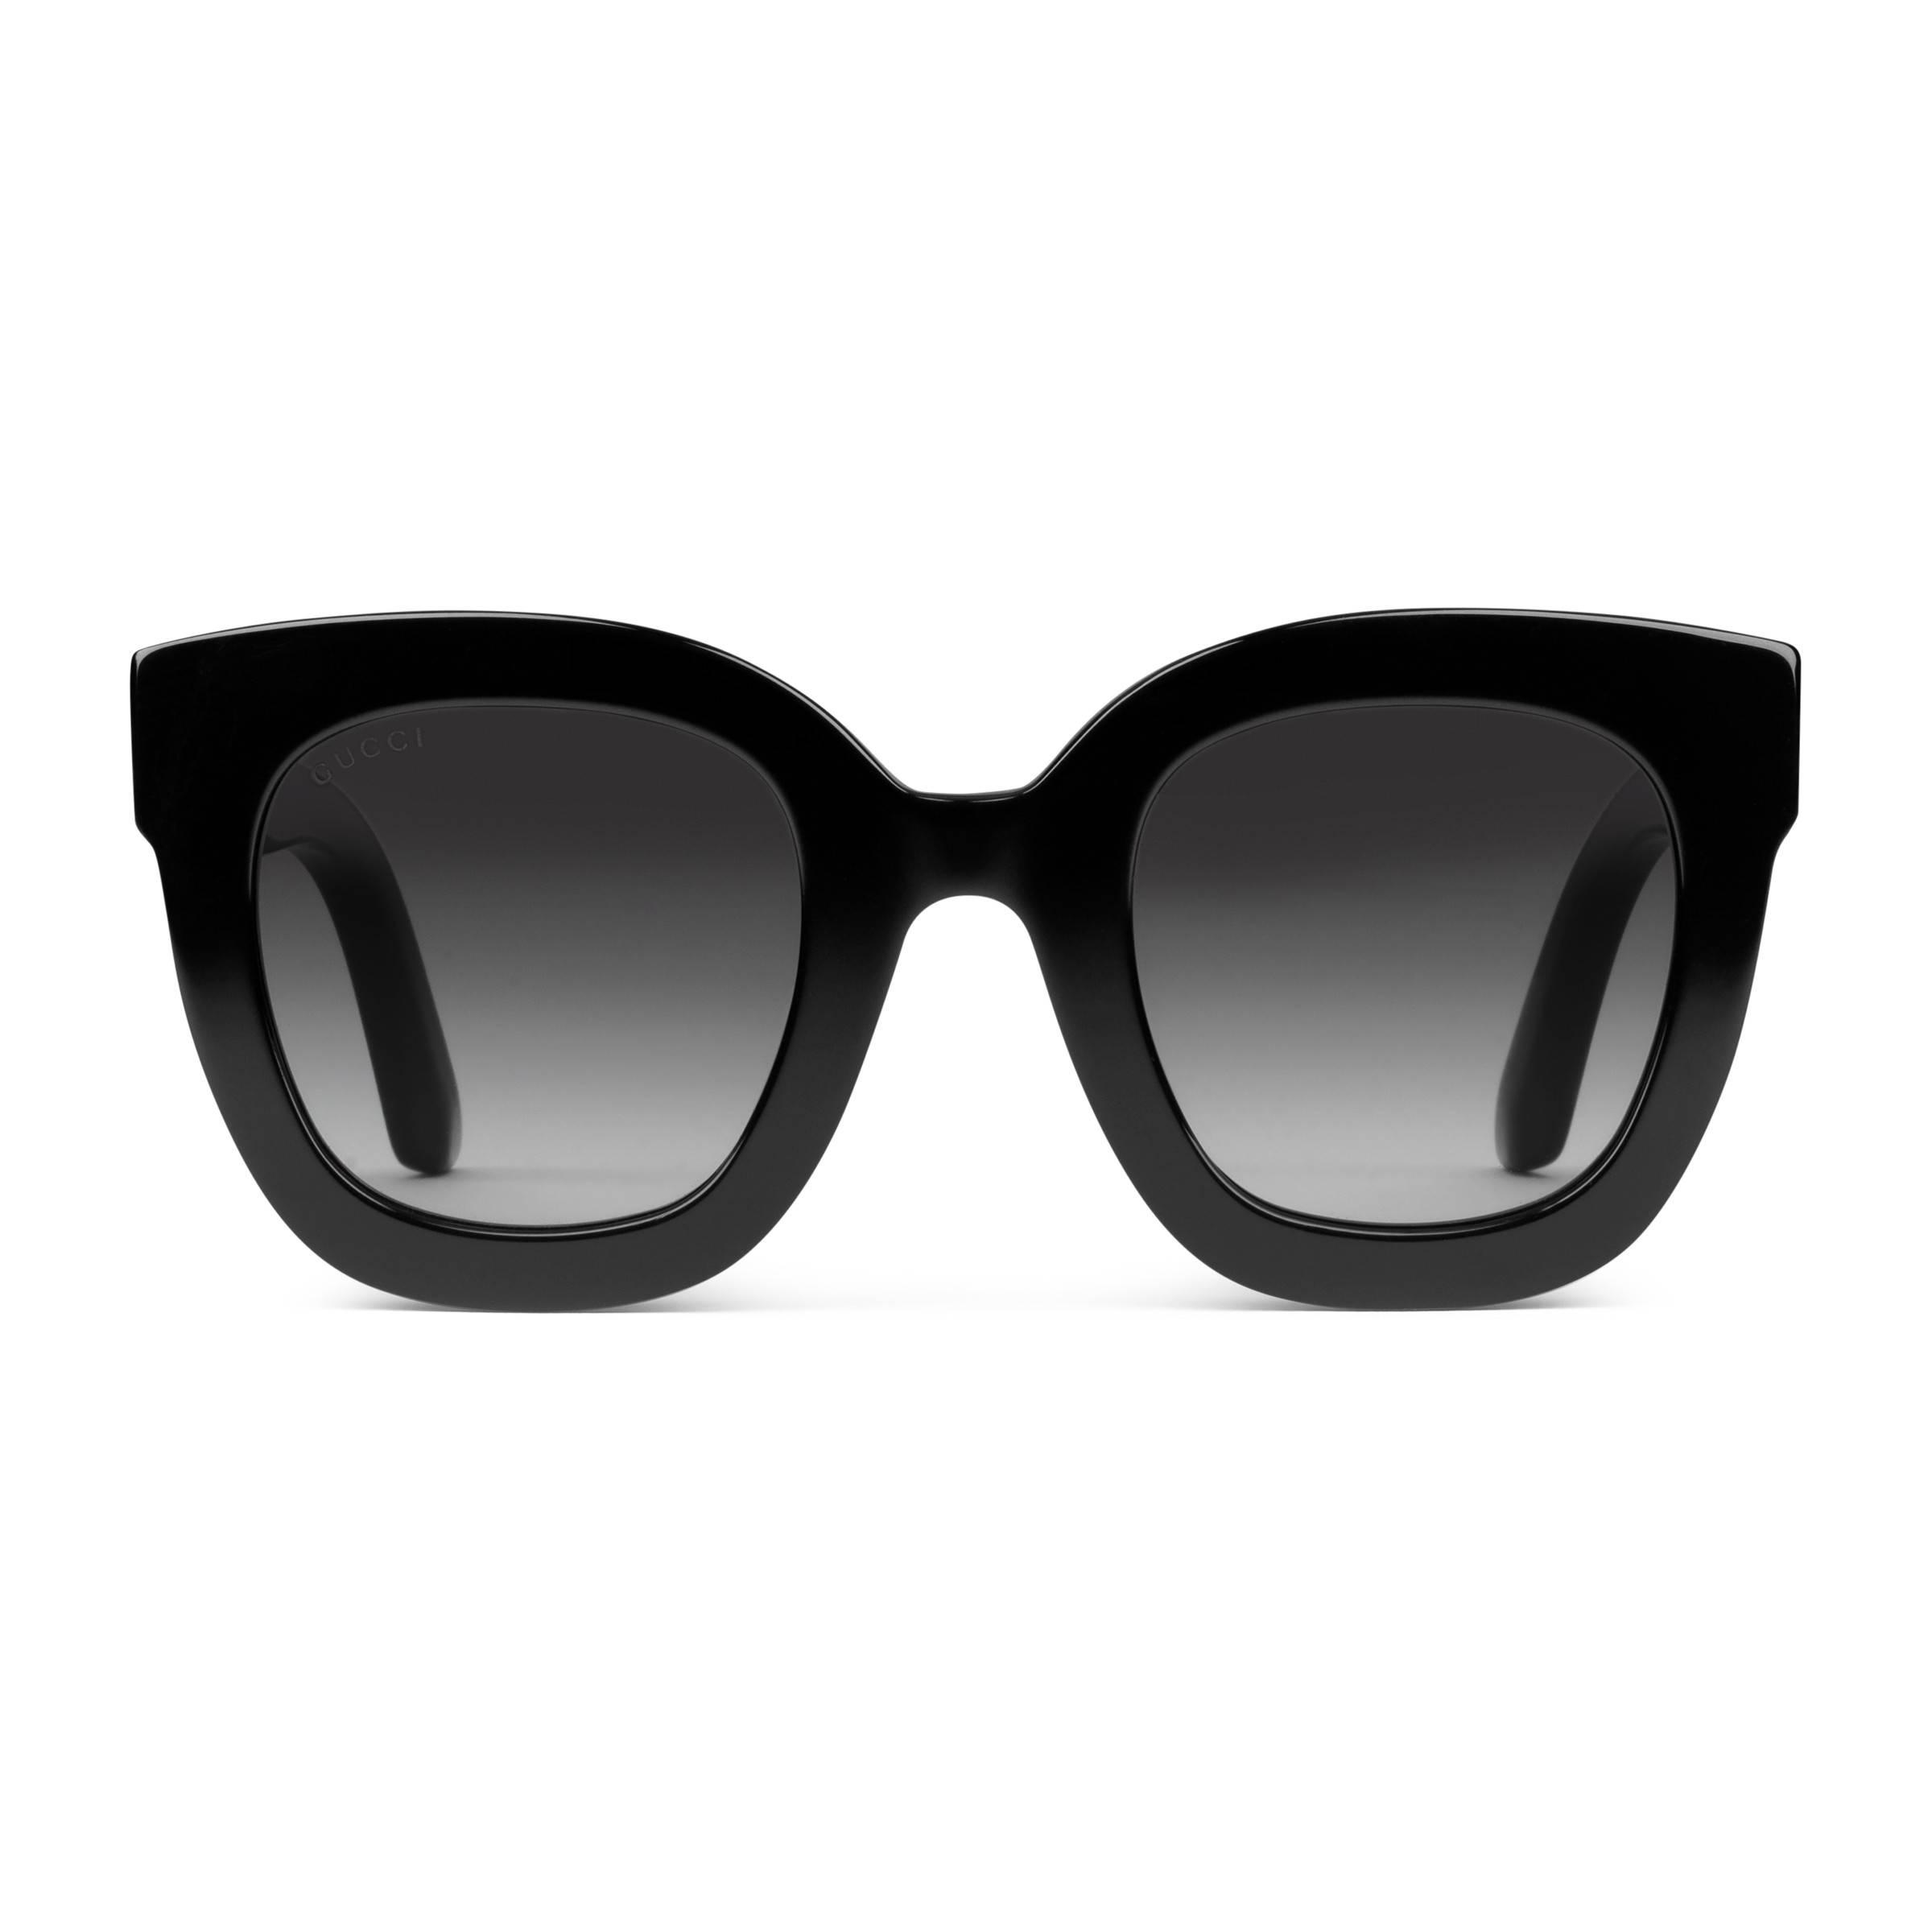 aa19a8e2be Gucci - Black Gafas de Sol con Montura Redonda de Acetato con Estrella -  Lyst. Ver en pantalla completa